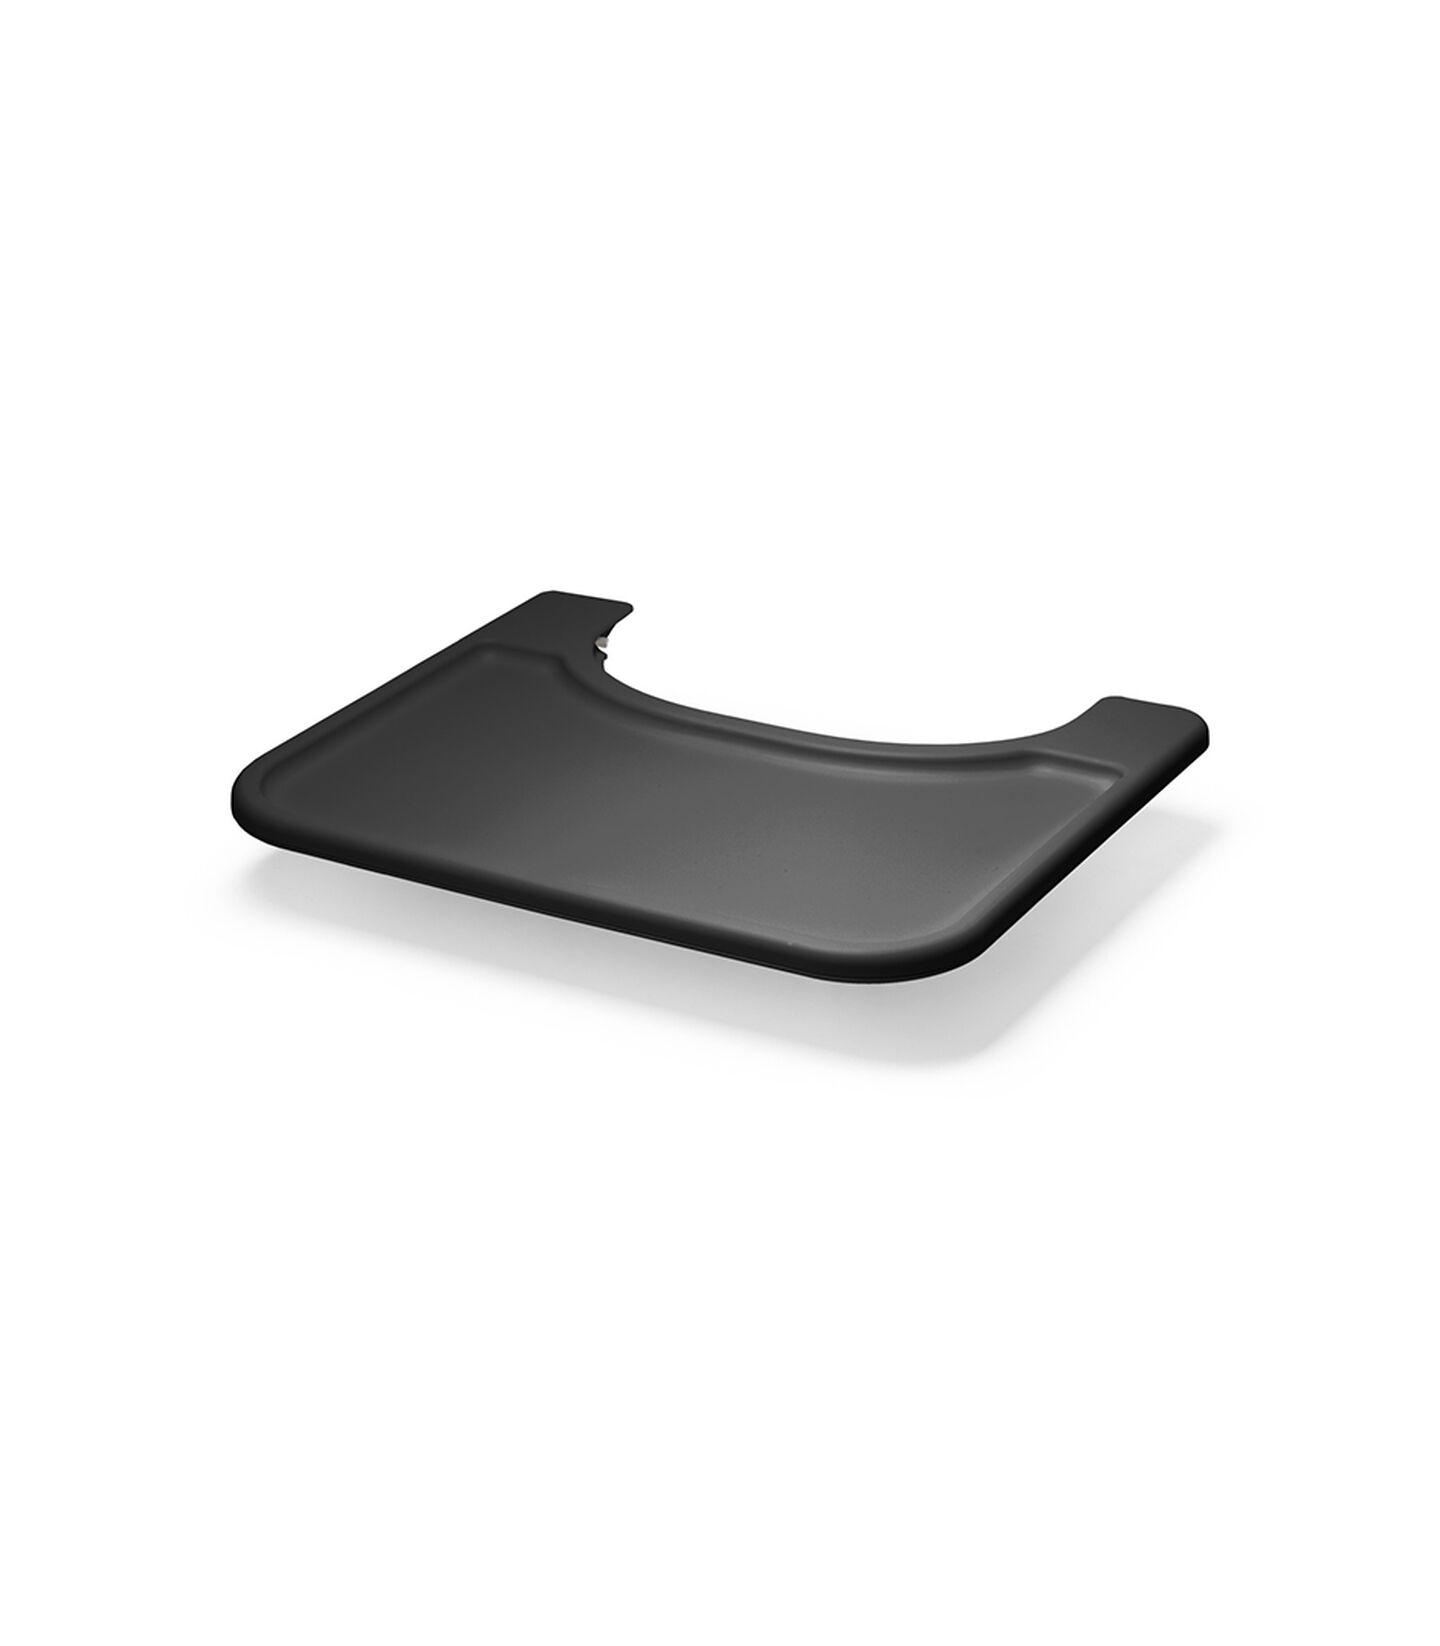 Stokke® Steps™ Baby Set Tray Black, Black, mainview view 1